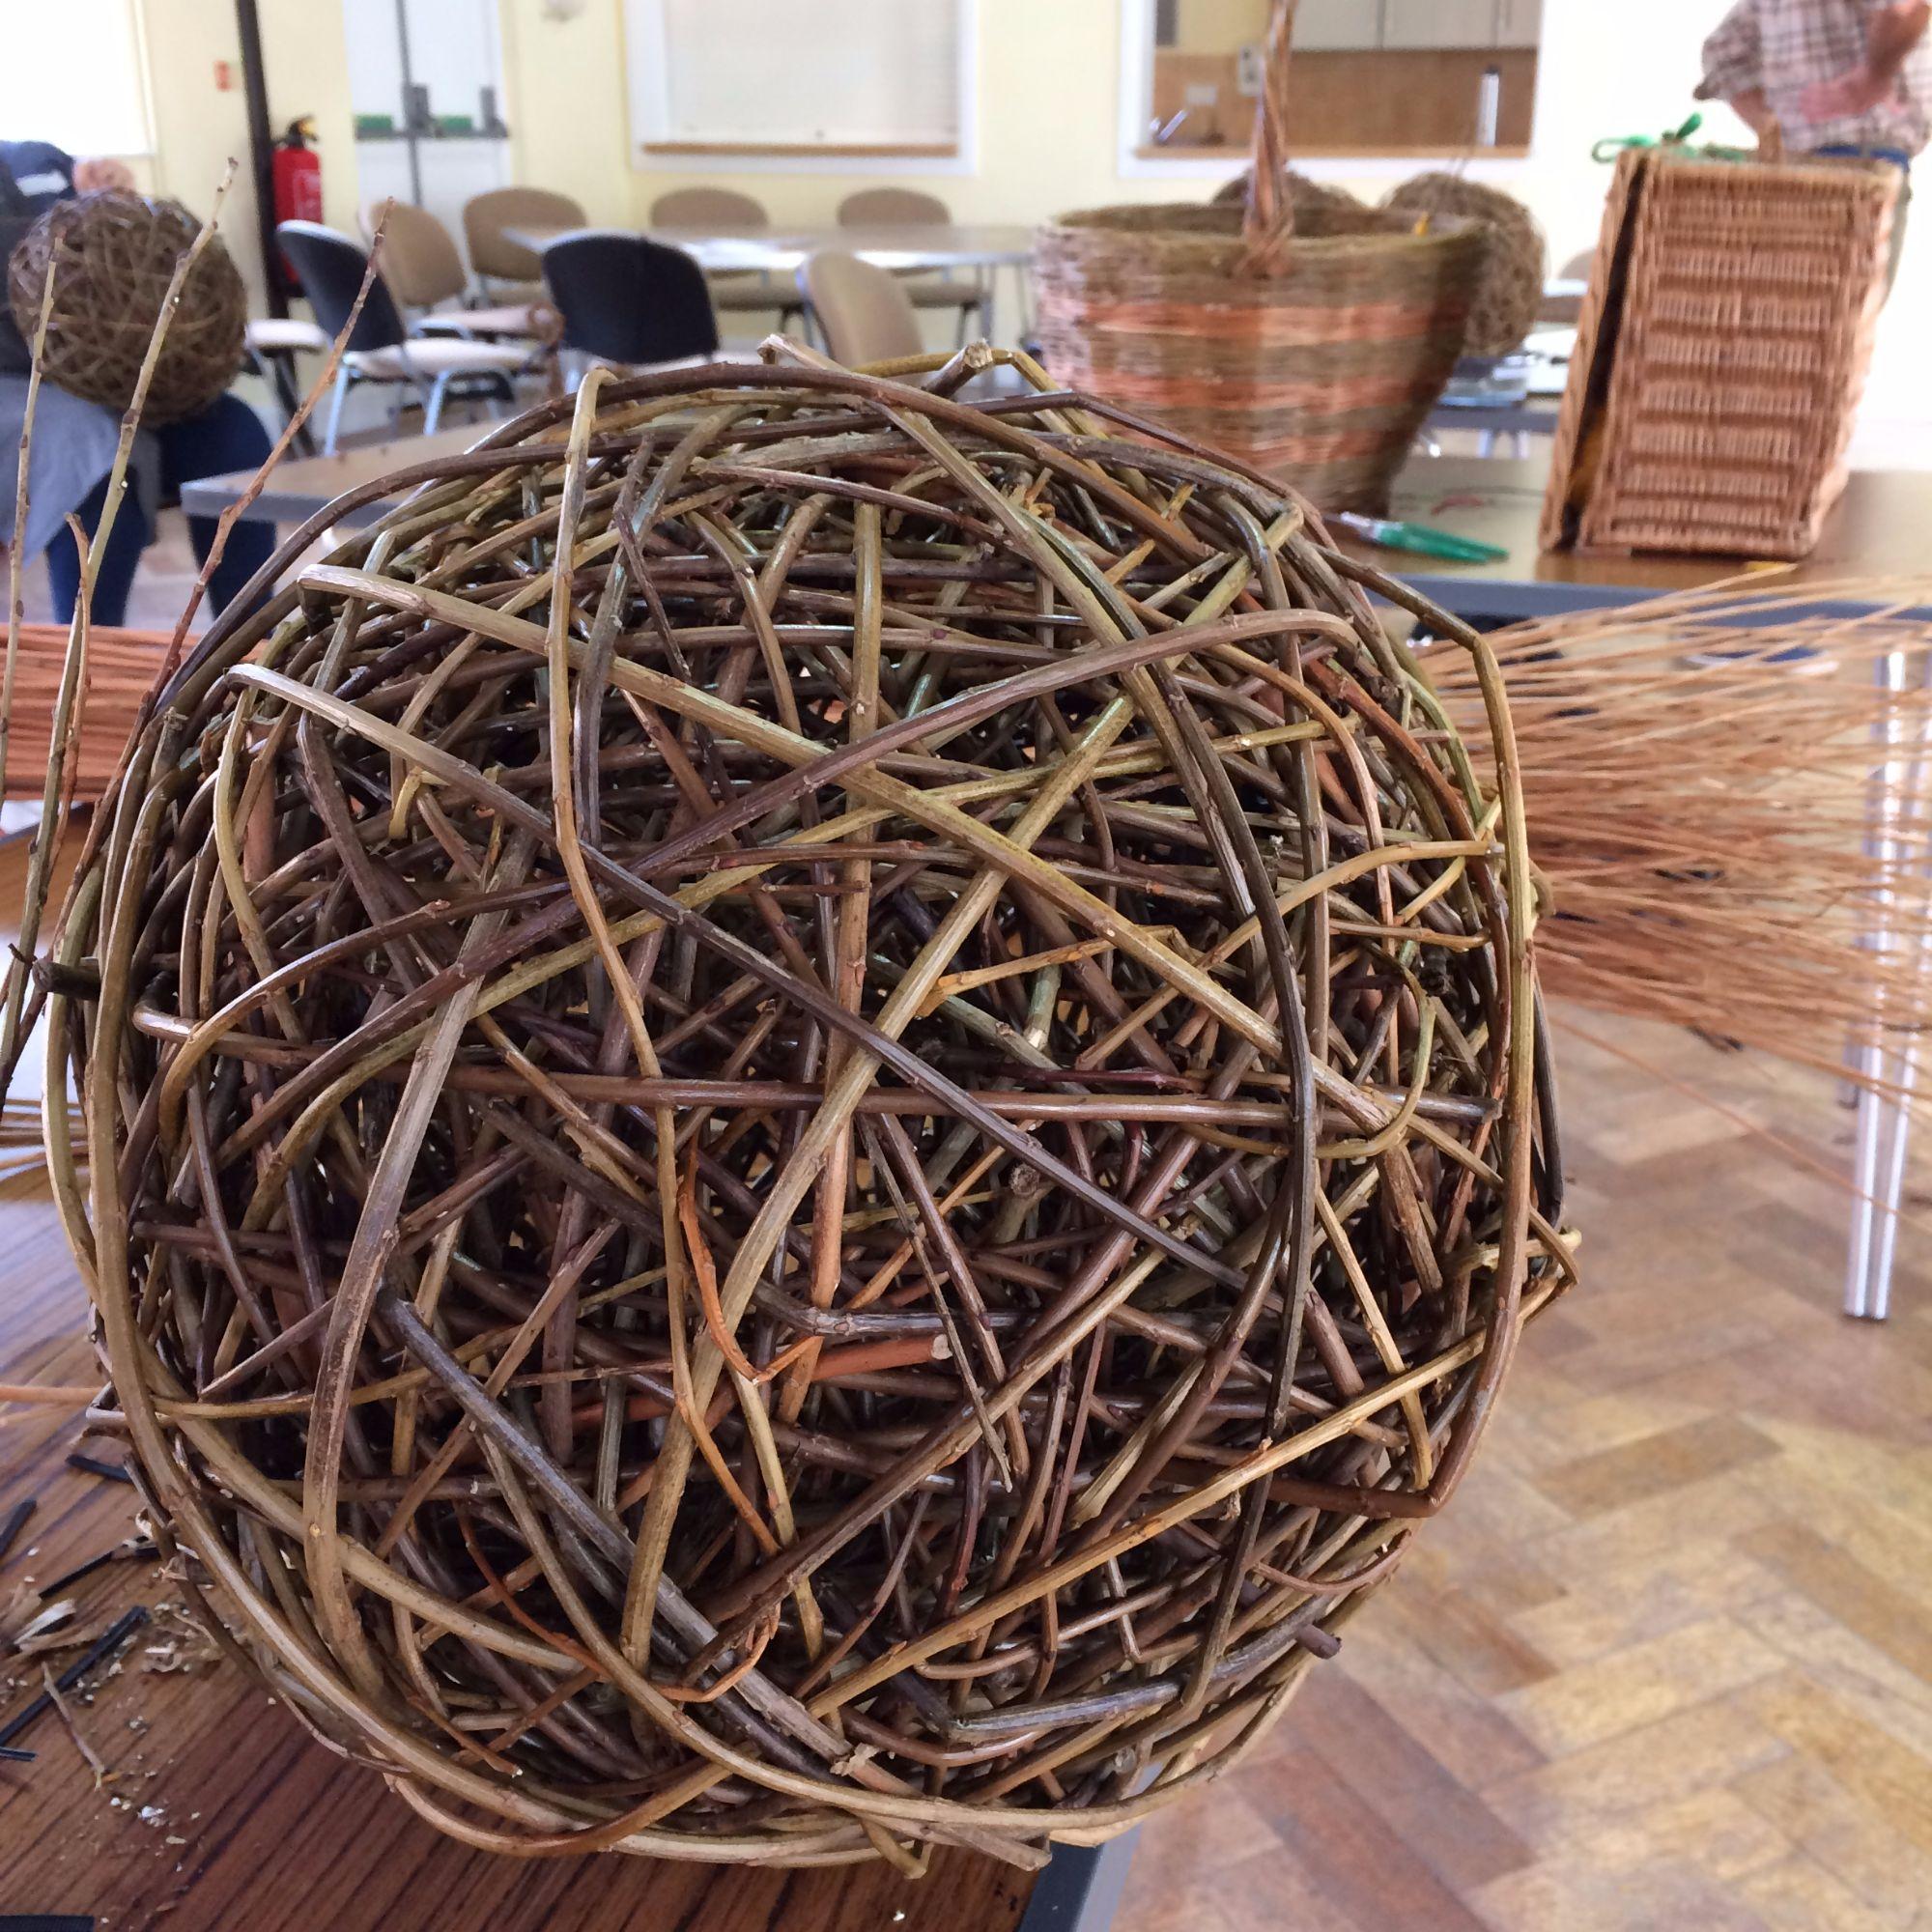 Willow Sphere Sculpture Workshop - Making